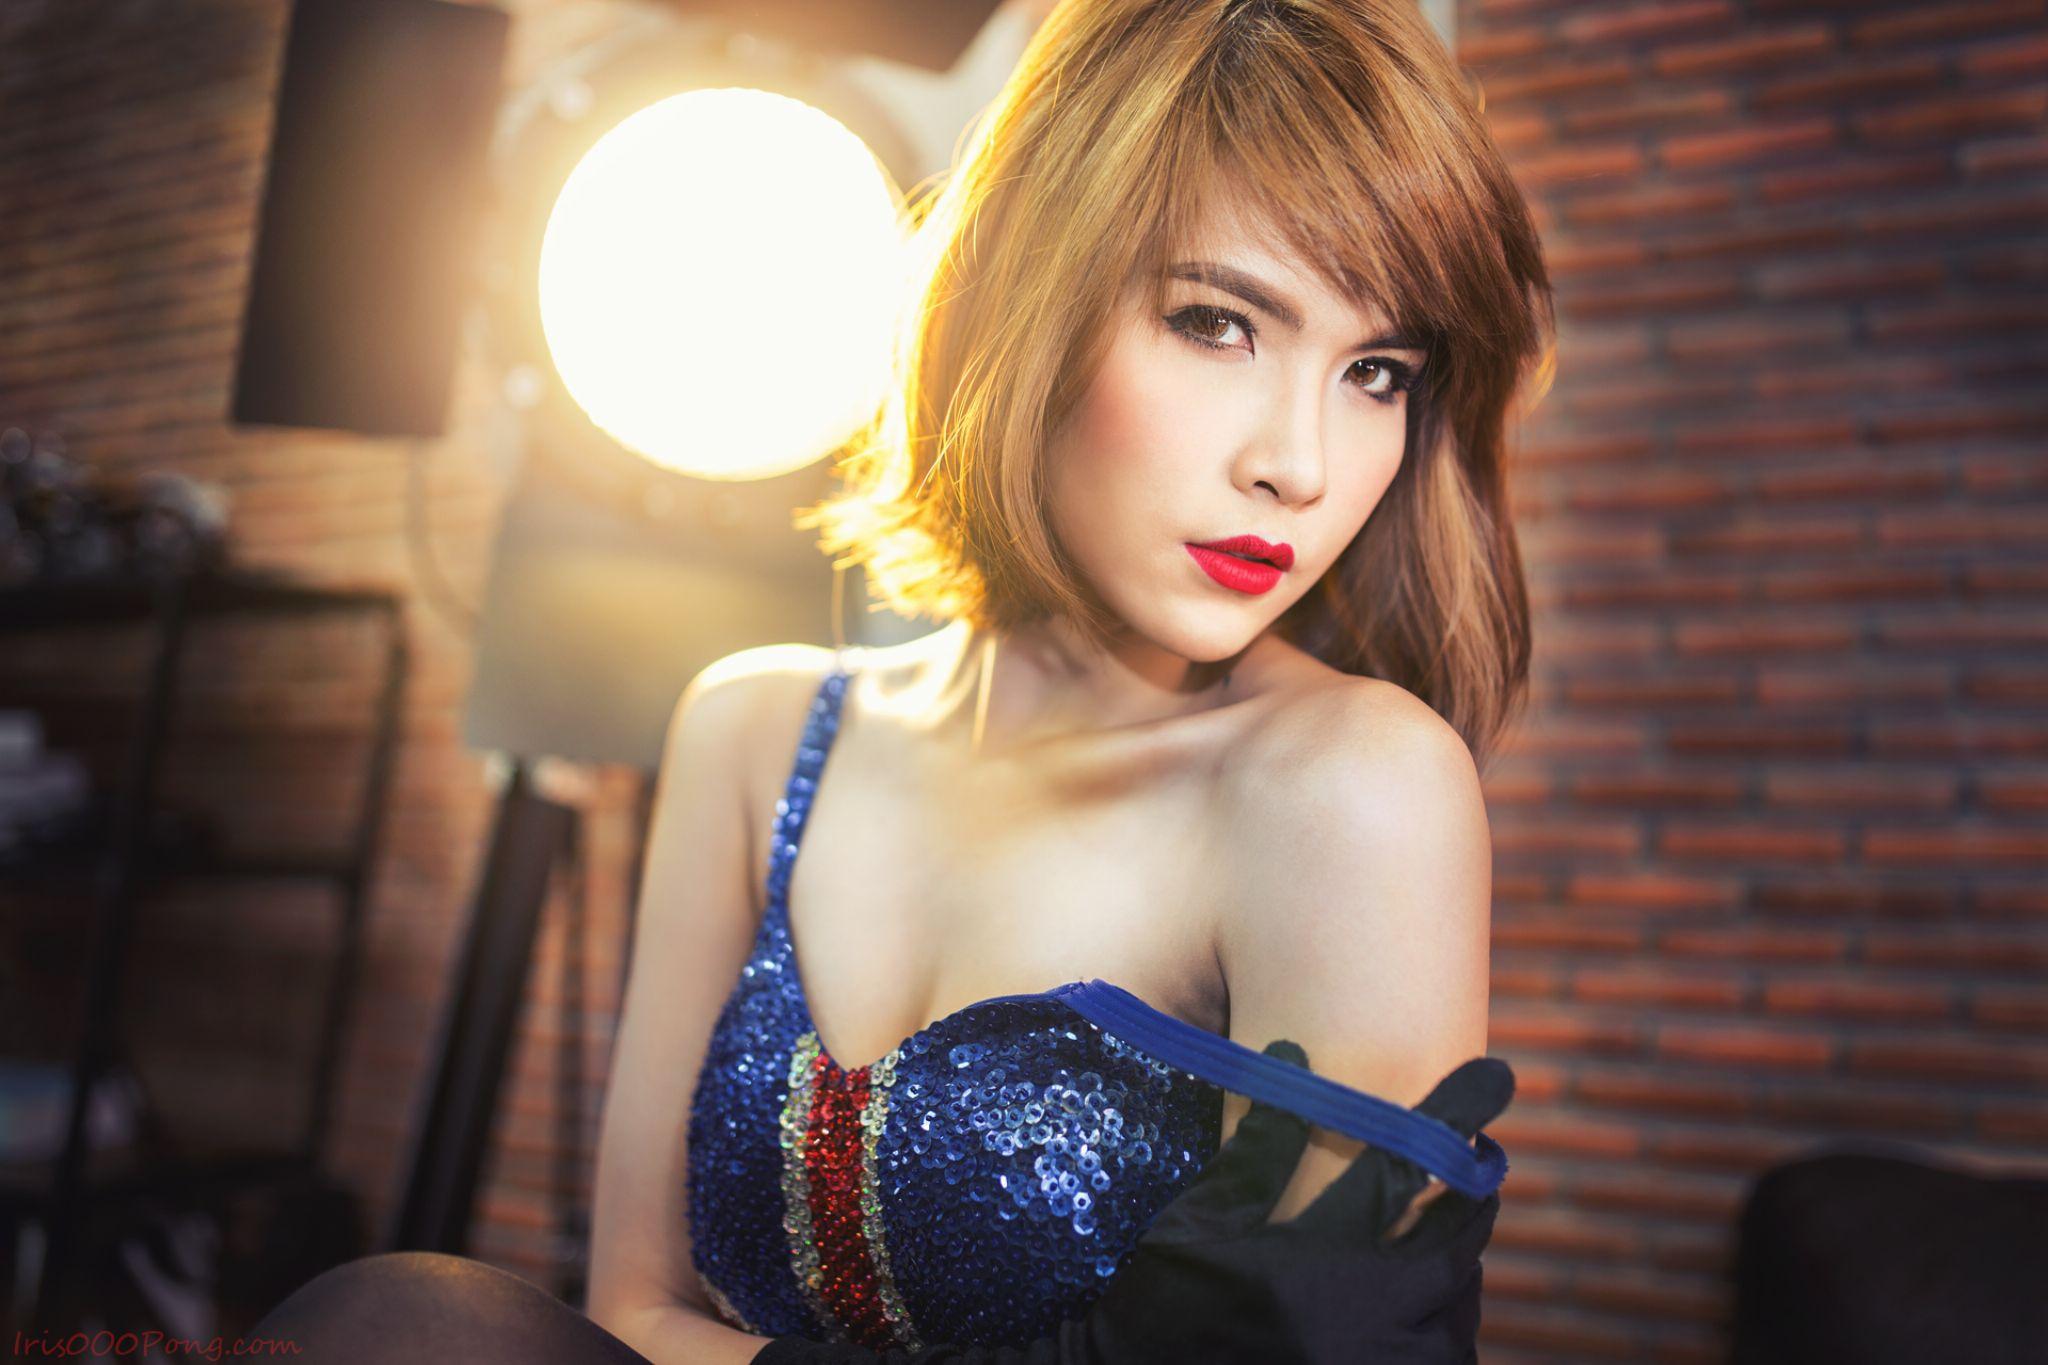 sexy by iris0o0pong